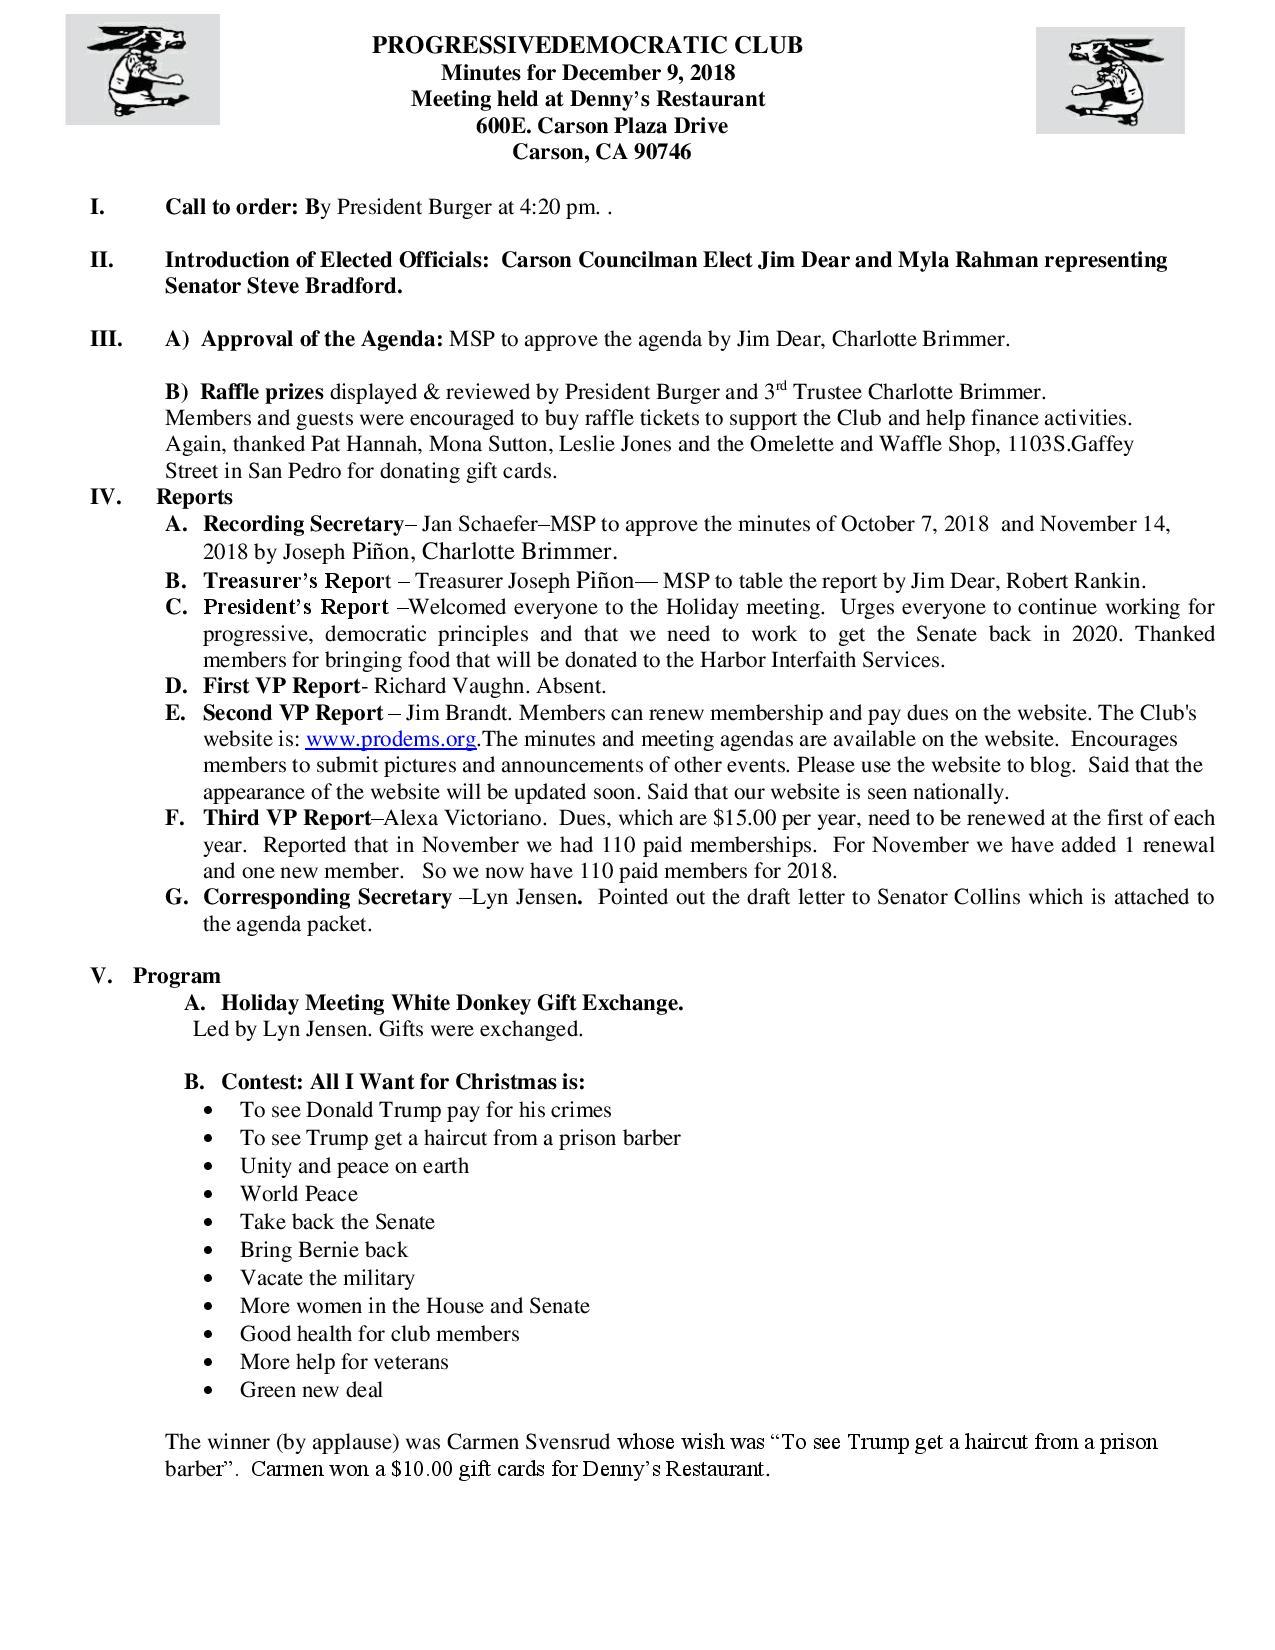 Minutes_December9_2018-page-001.jpg